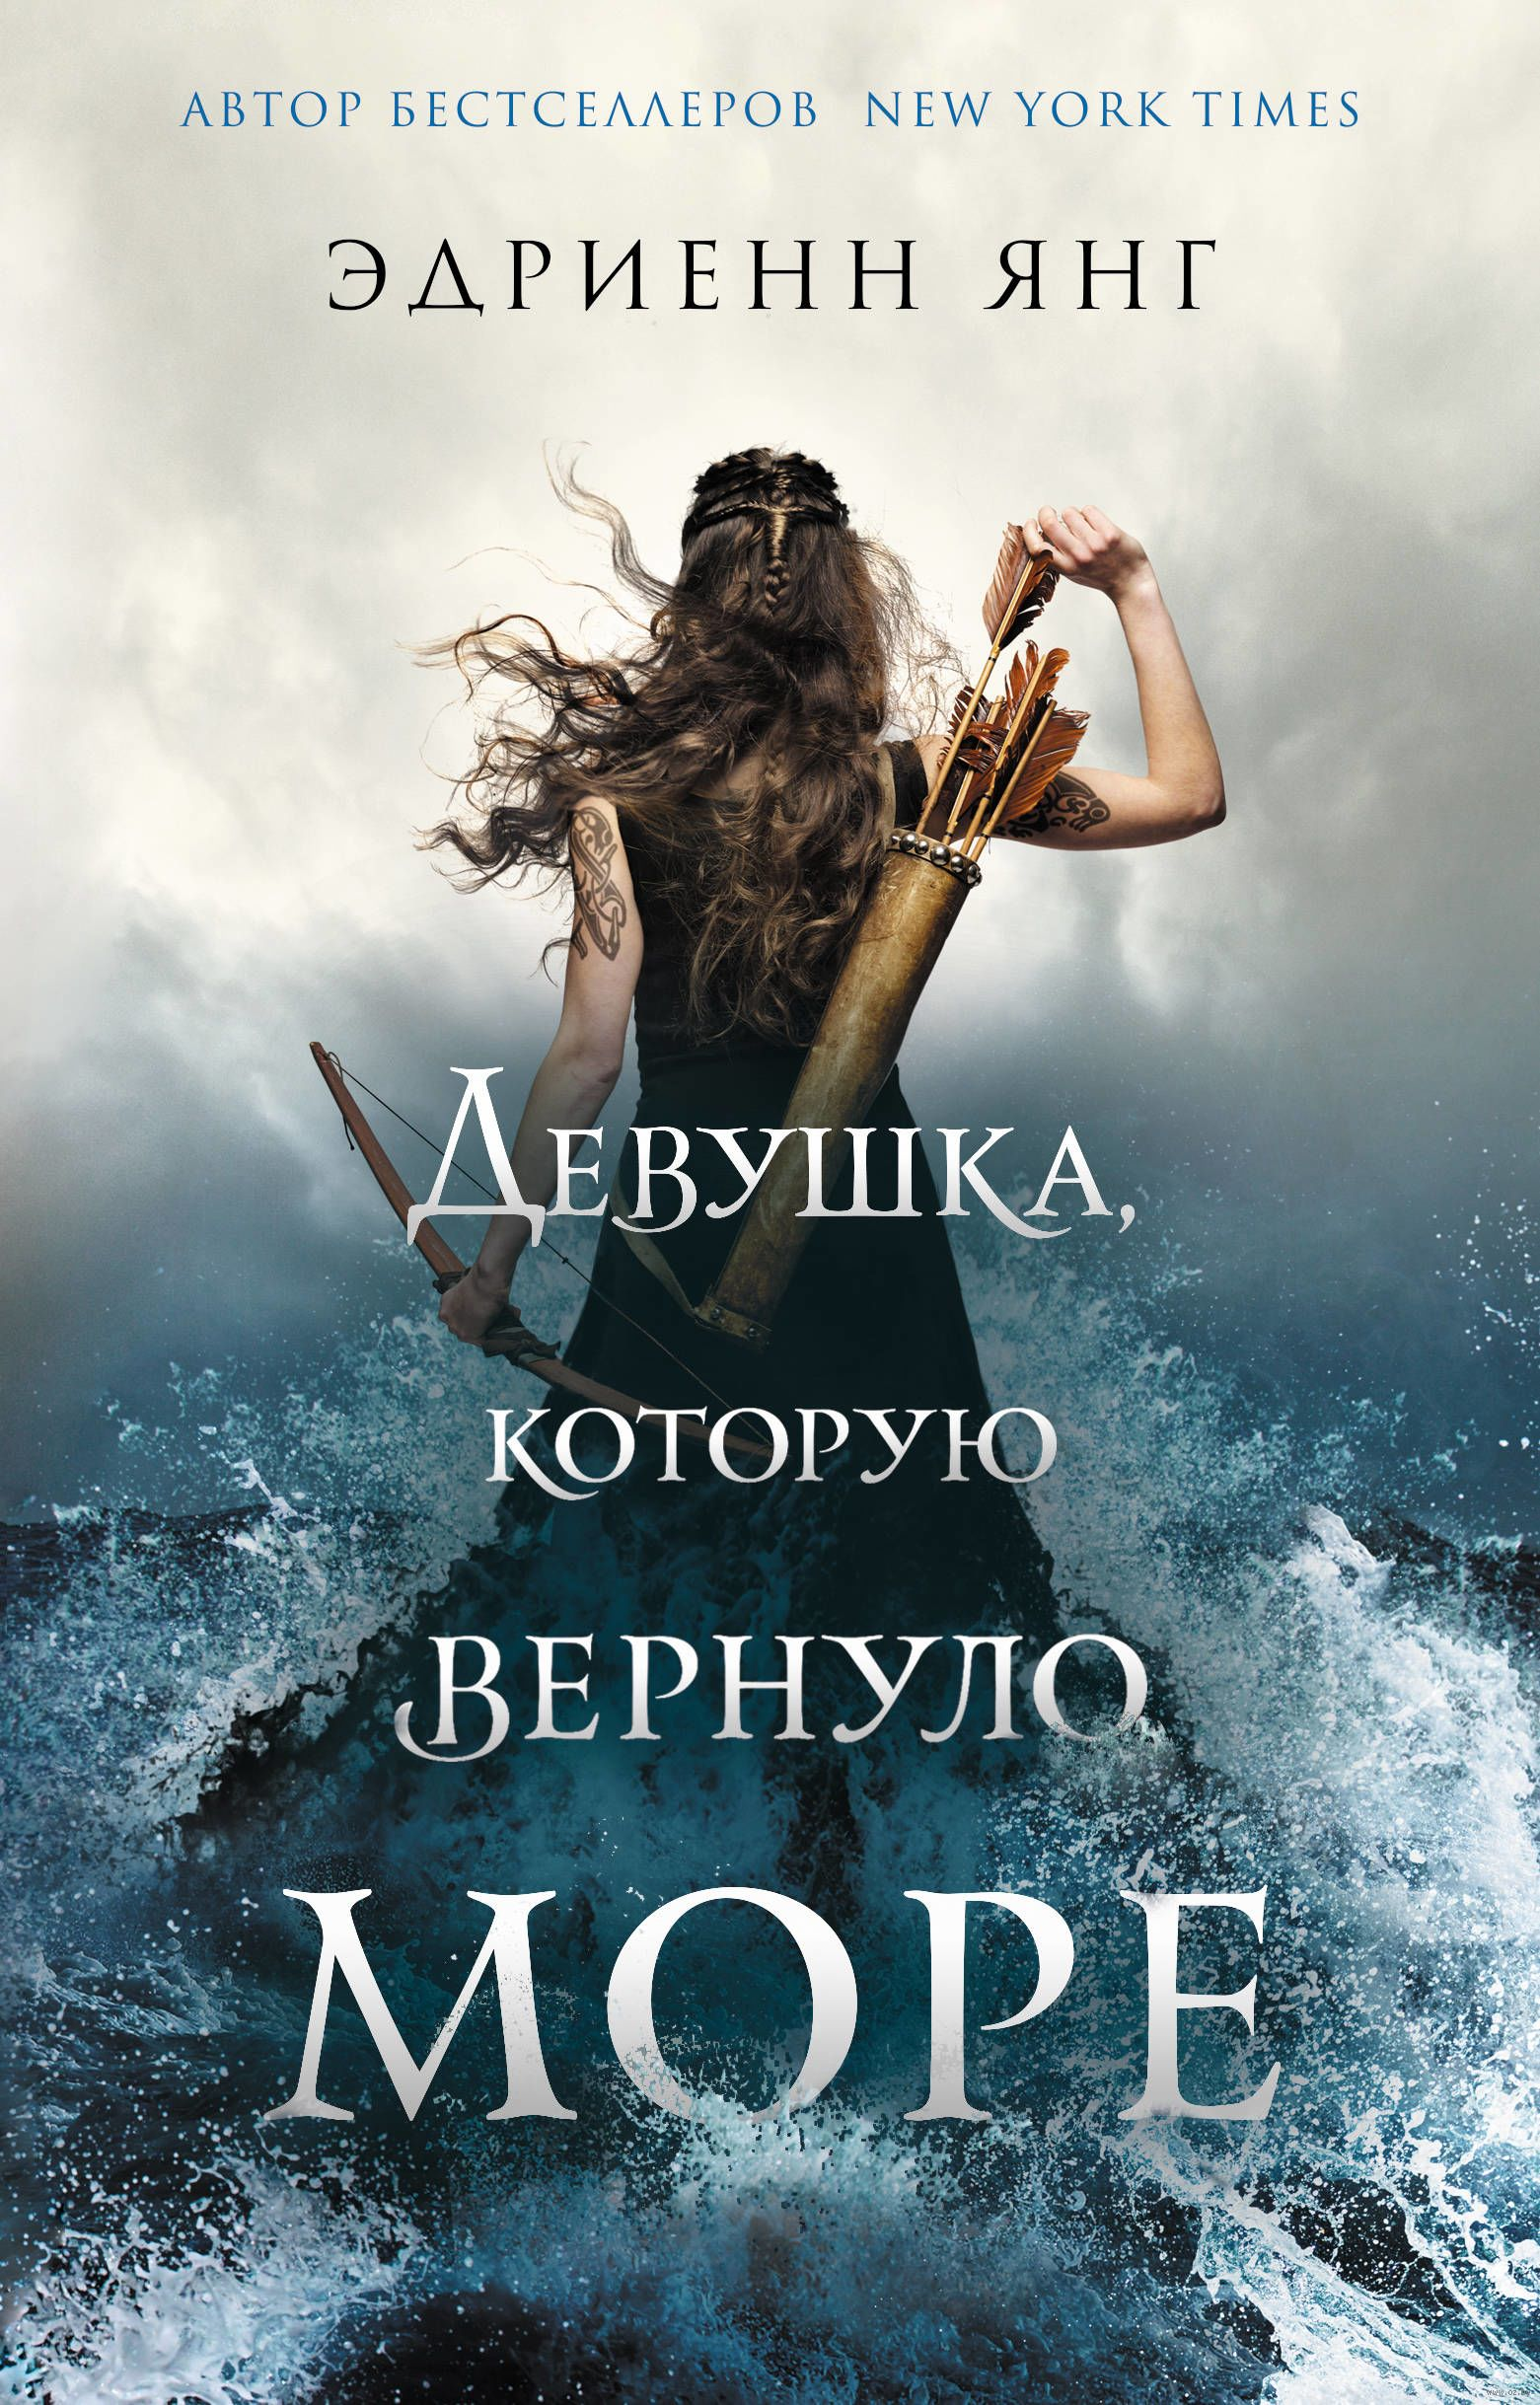 http://chelib.ru/wp-content/uploads/img/books/yang-devuska-kotoruy-vernulo-more.jpg